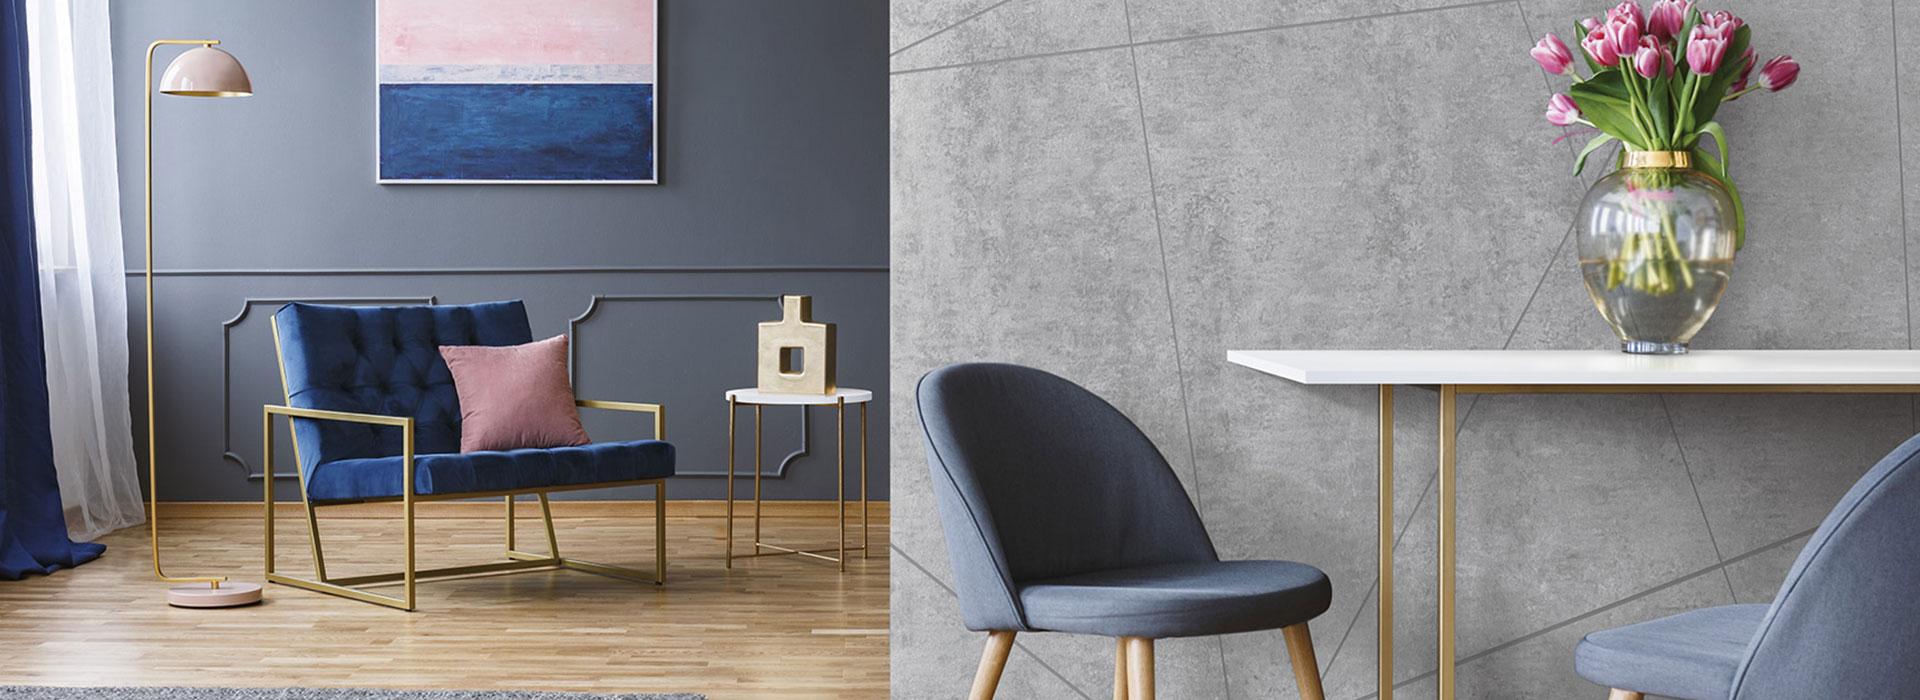 ColorCore Compact Elemental Concrete and Polar White